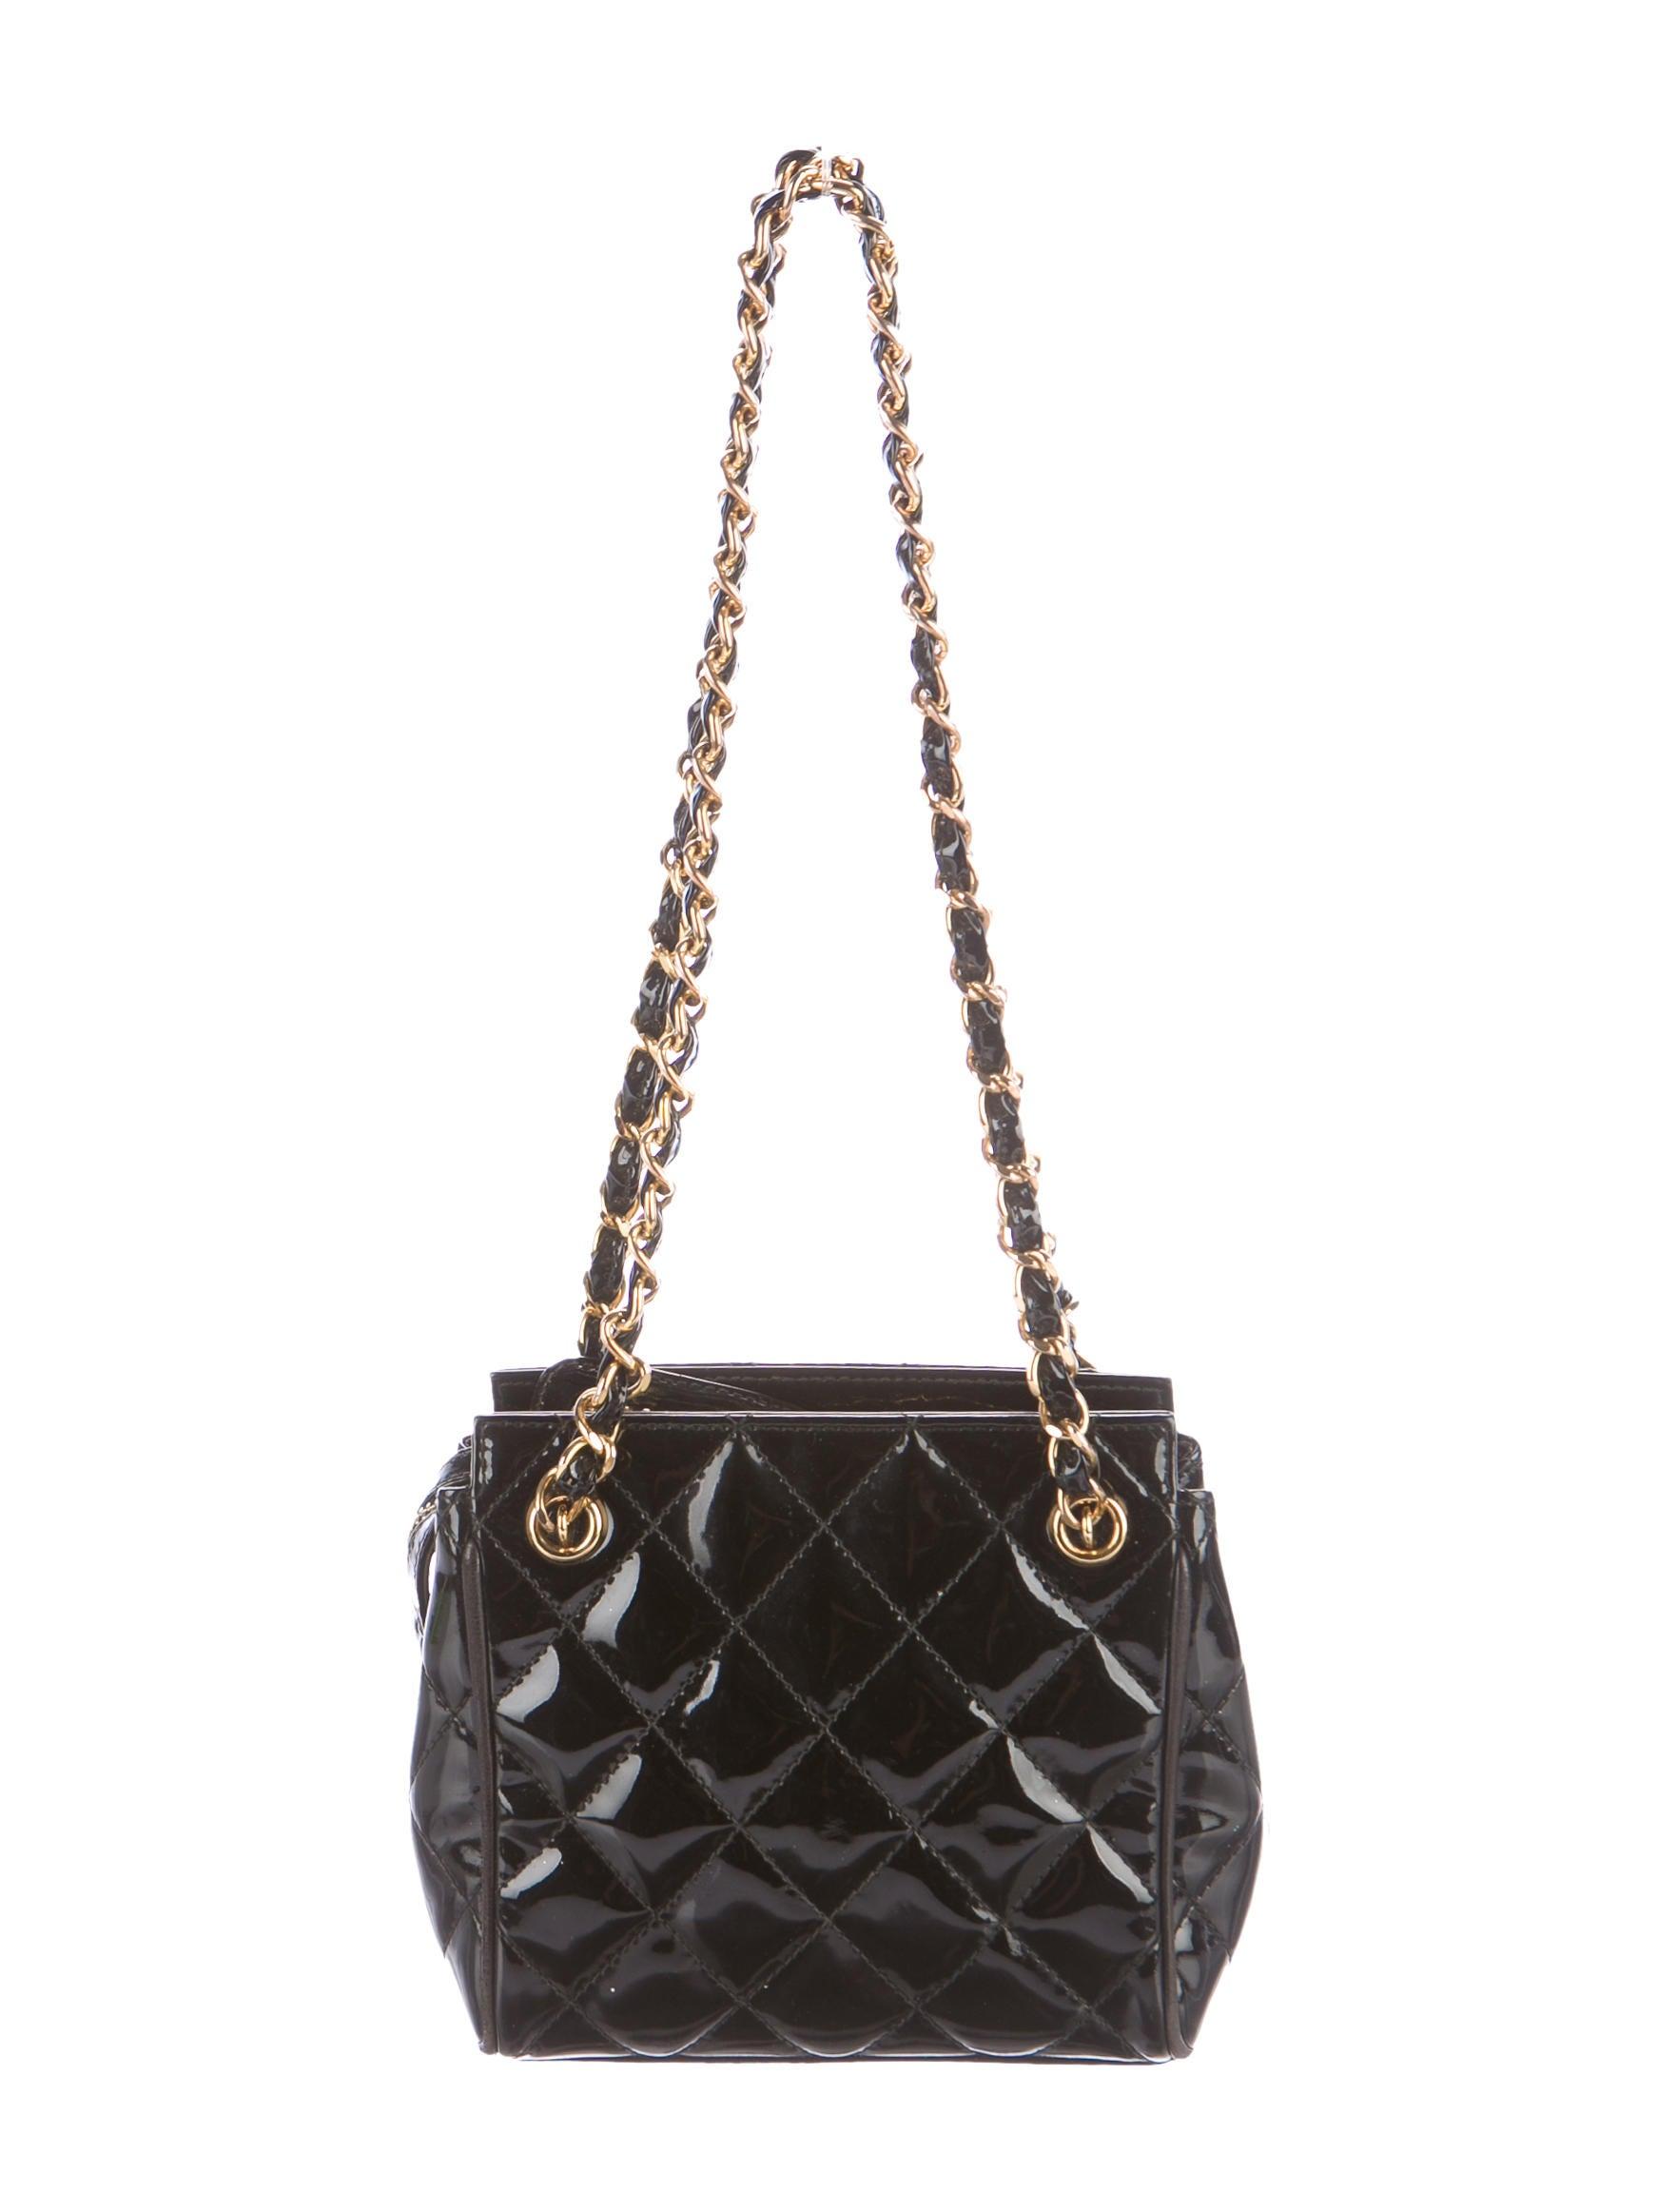 Chanel Patent Vintage Quilted Mini Shoulder Bag Handbags